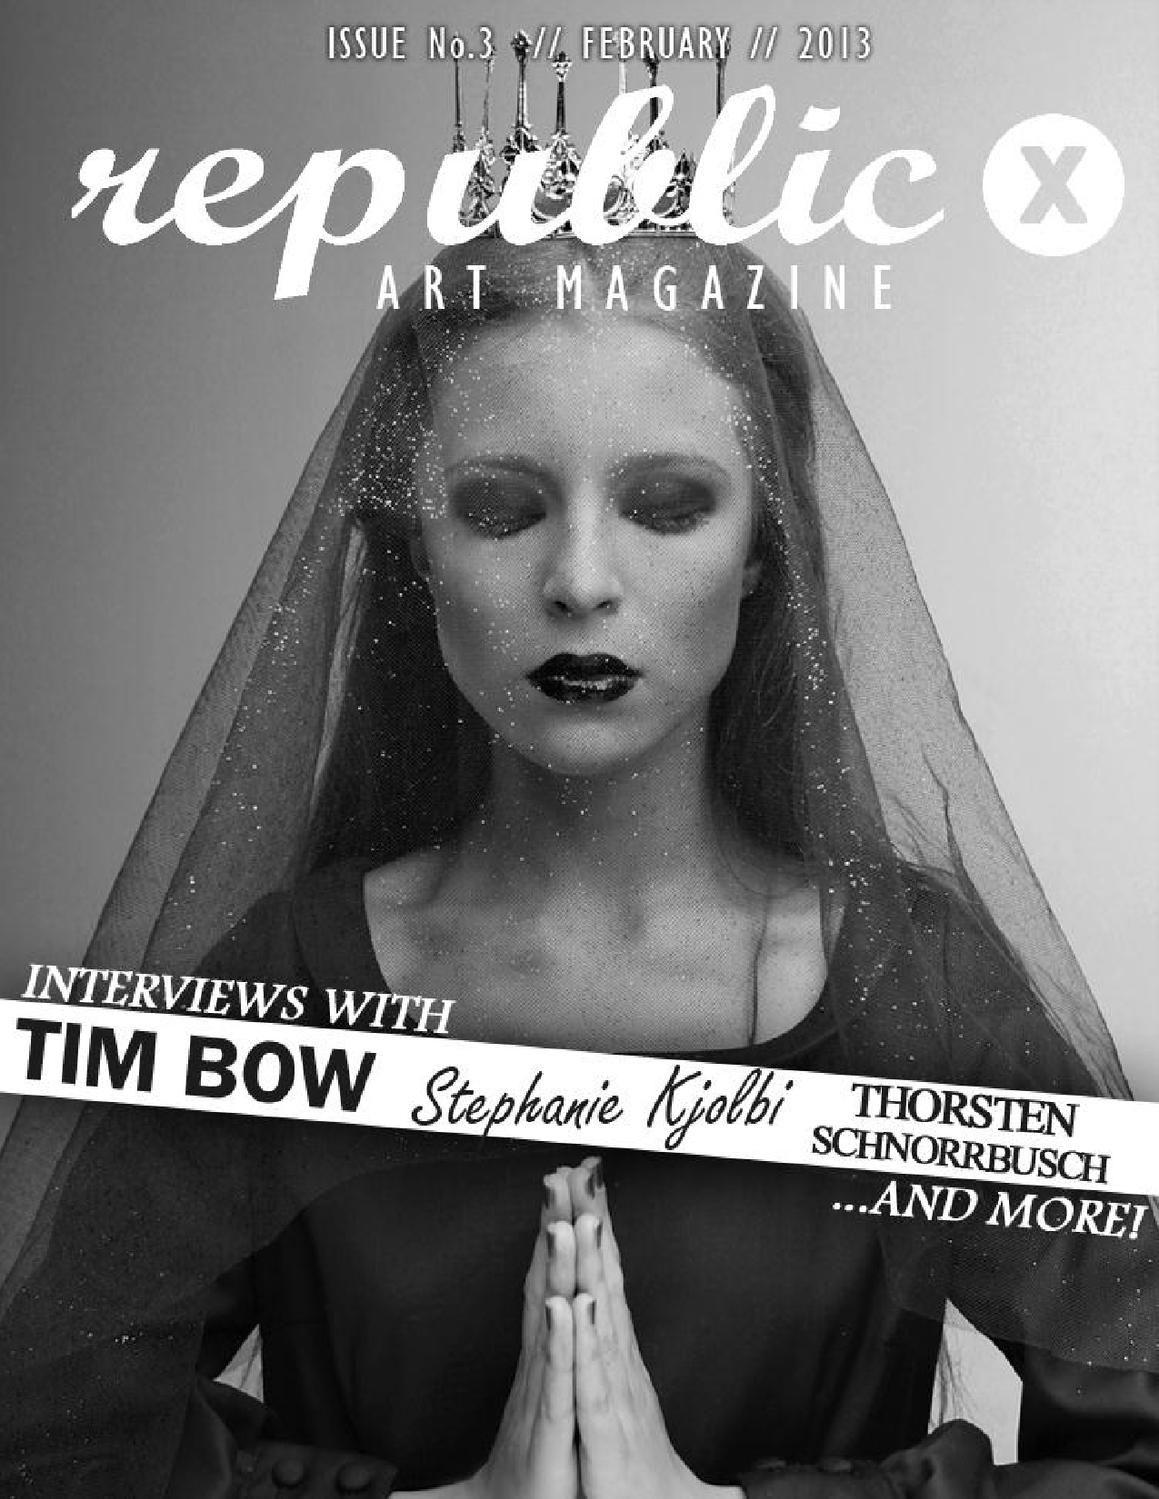 REPUBLIC X - Art Magazine - ISSUE 3  ART MAGAZINE // Issue No3